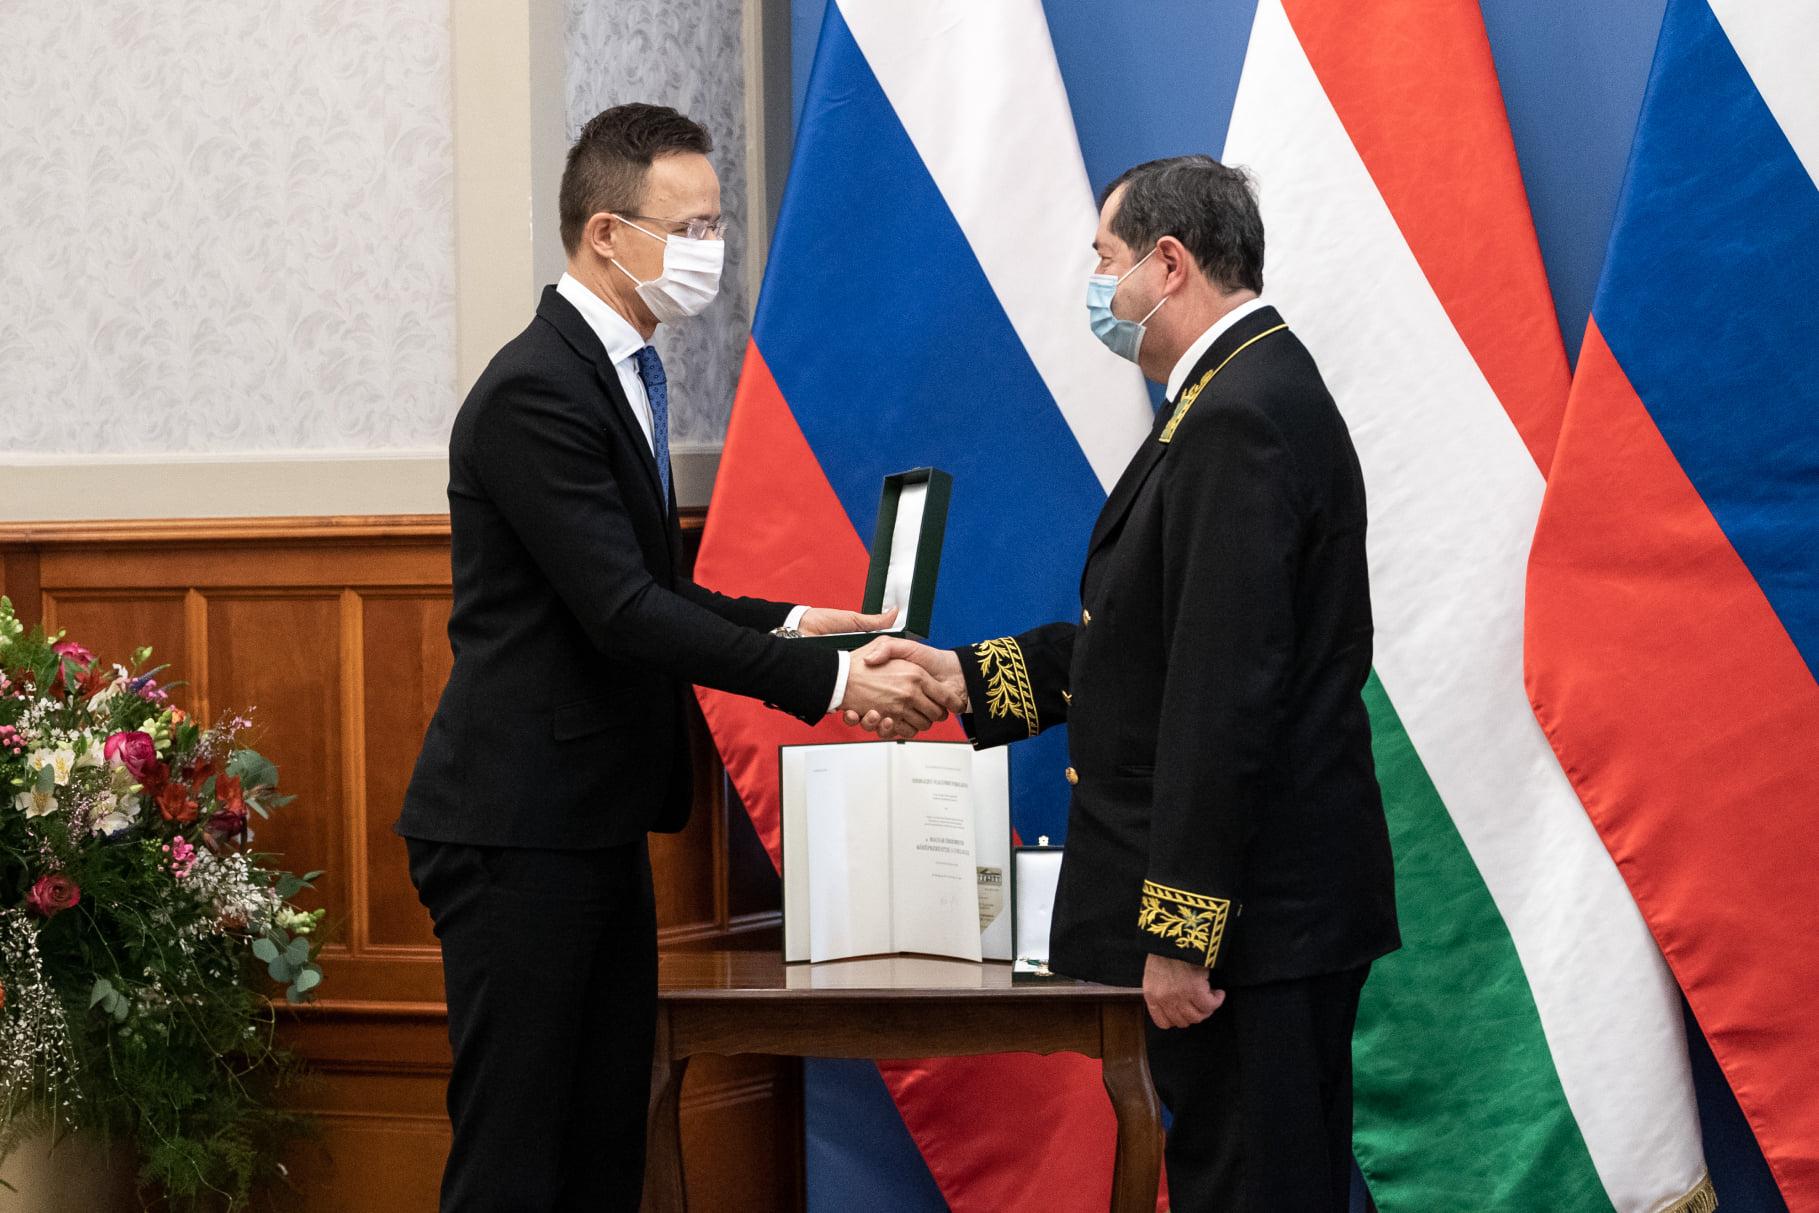 FM Szijjártó Awards Order of Merit to Outgoing Russian Ambassador